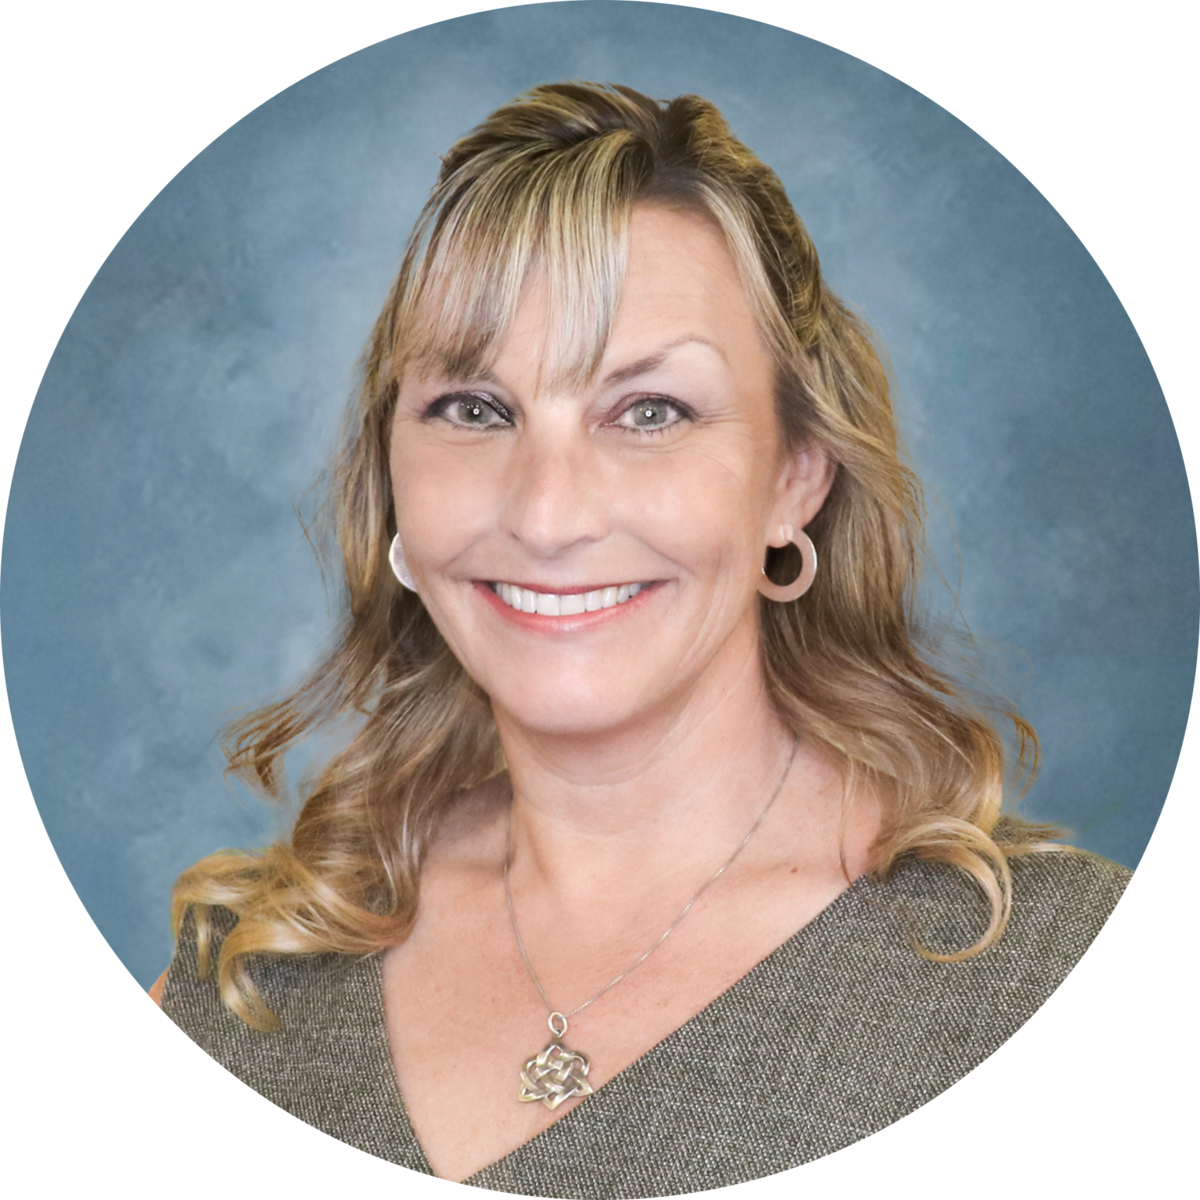 Principal MeLisa Thalacker